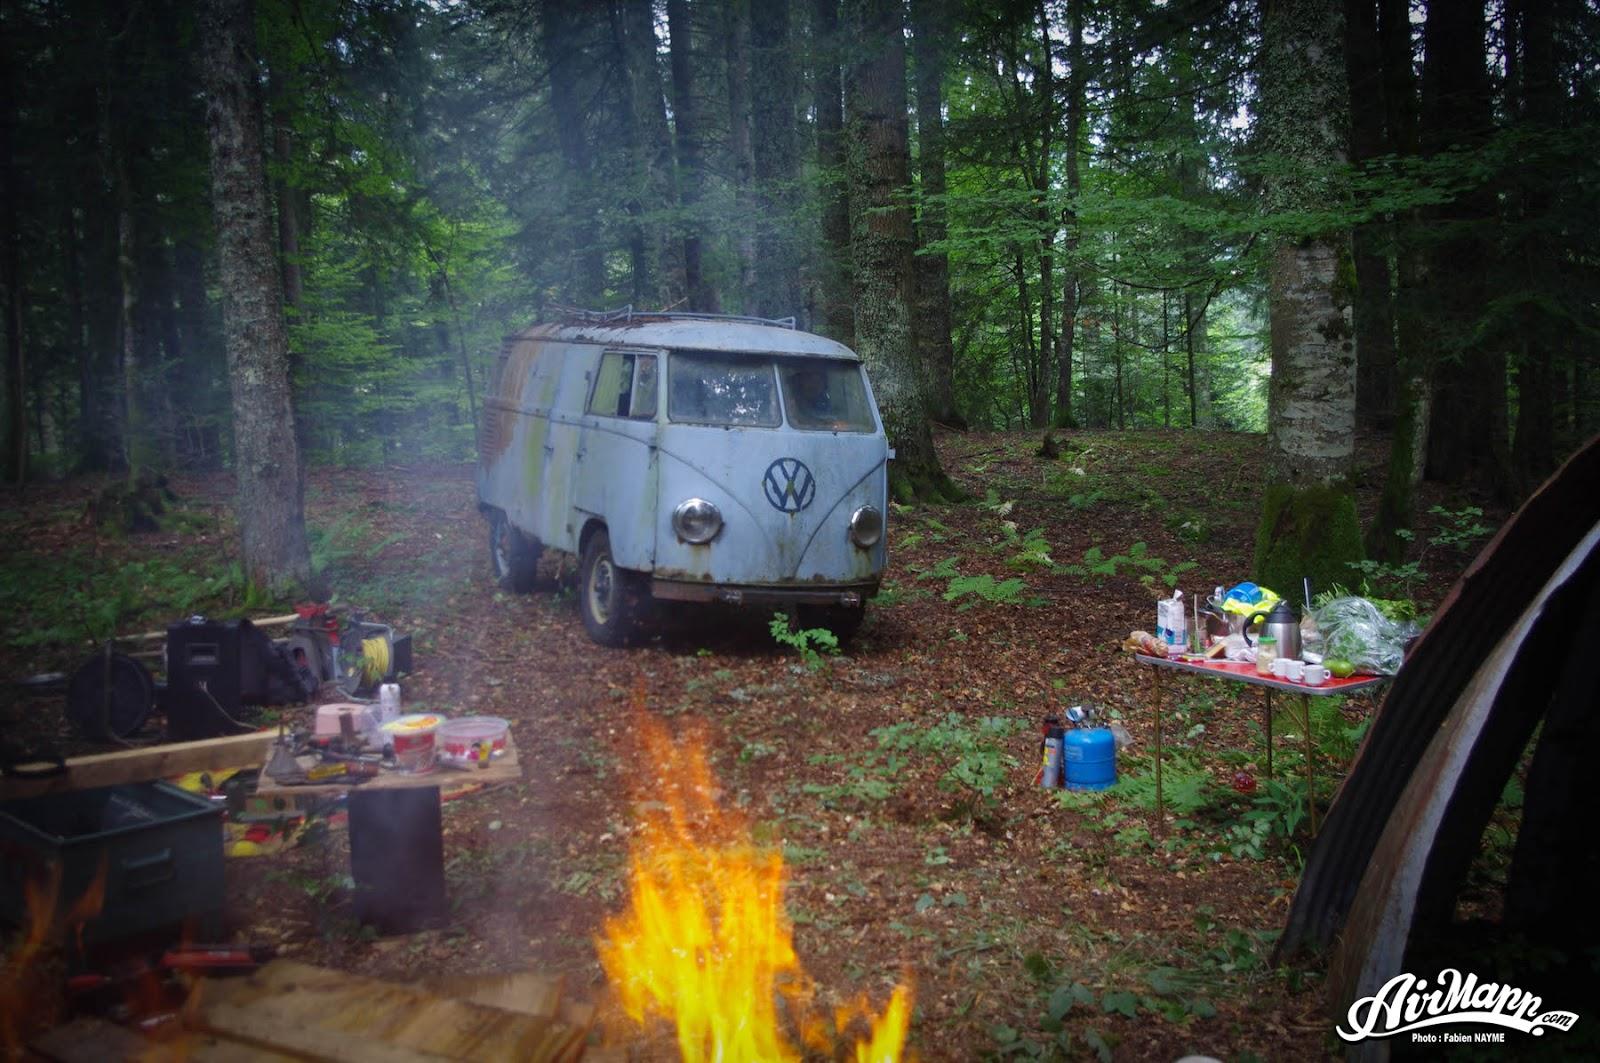 vw2Bmicrobus Η απίστευτη ιστορία ενός VW που δούλεψε μετά από 40 χρόνια Caber Van, Camper Van, Fun, VAN, videos, Volkswagen, Volkswagen Microbus, VW, VW Panelvan, VW Transporter, zblog